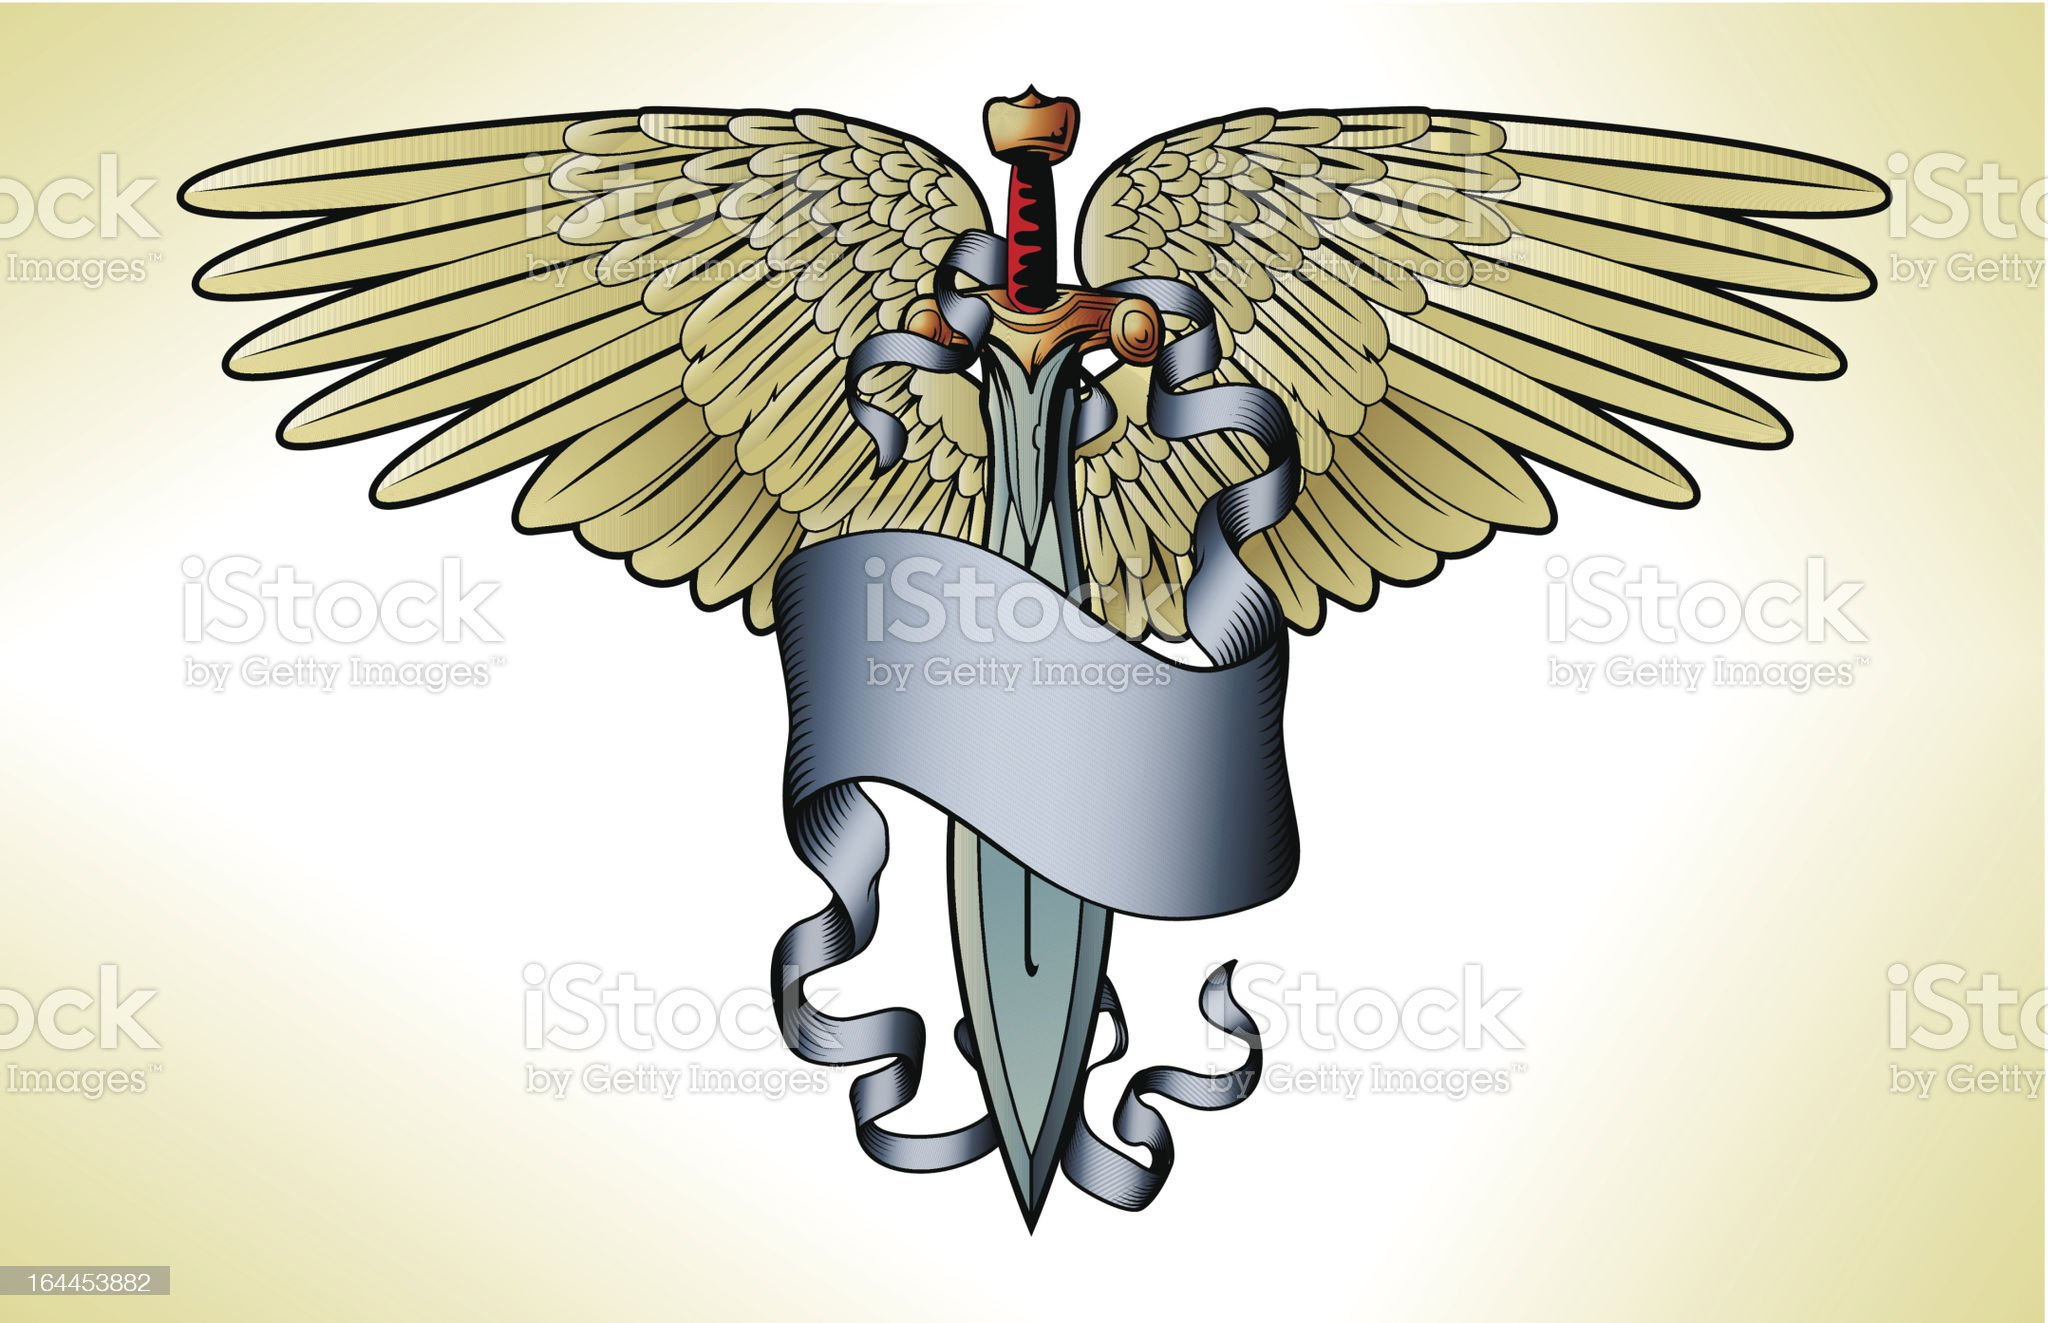 Retro sword banner tattoo royalty-free stock vector art